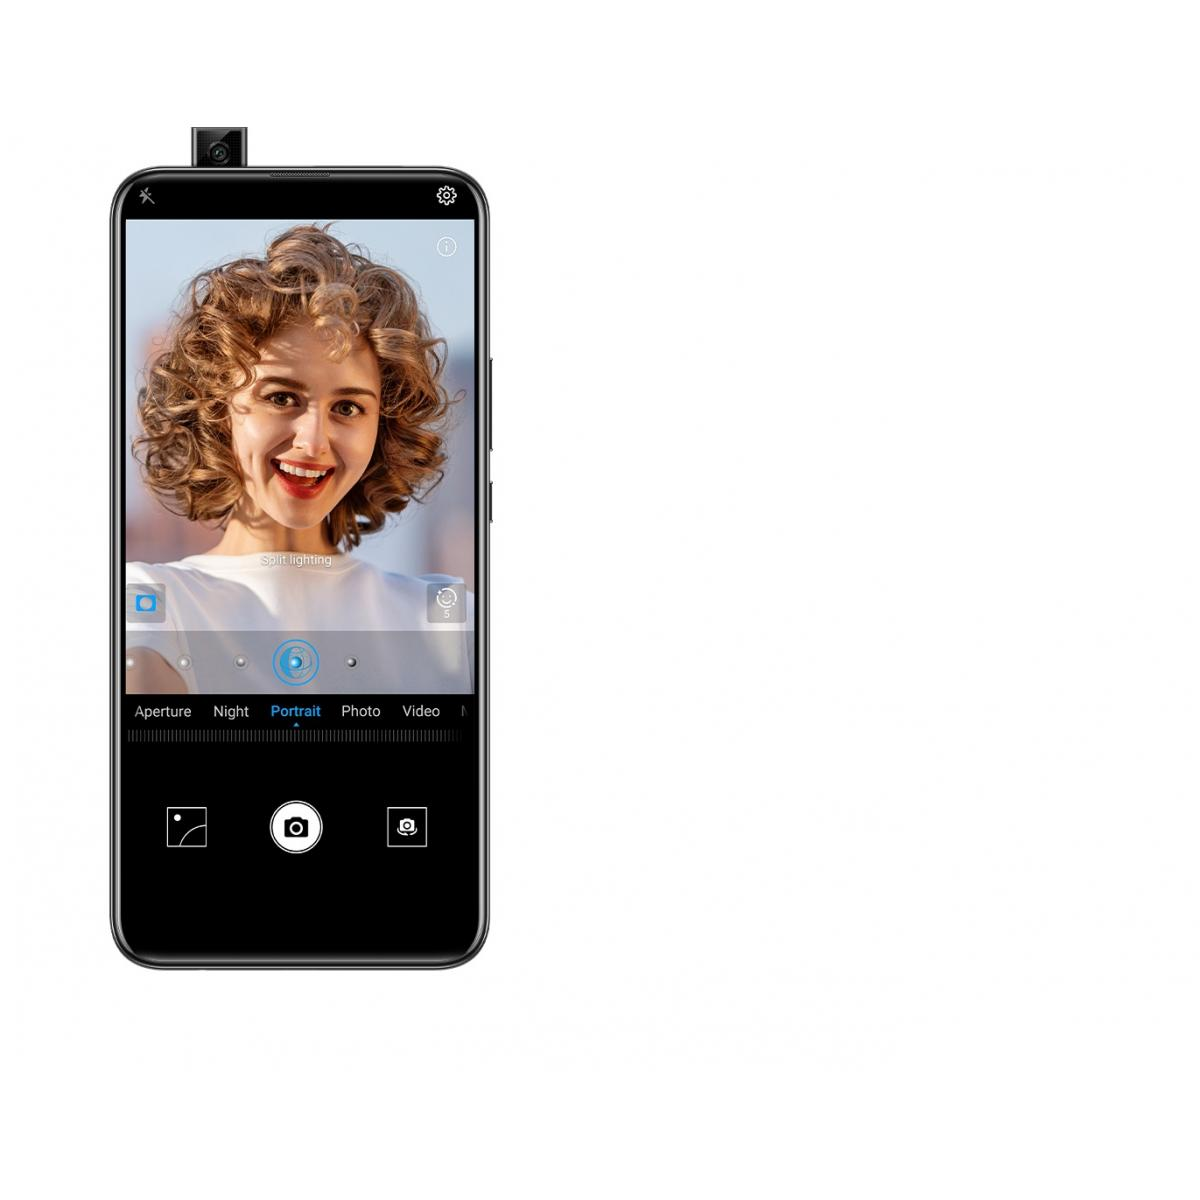 Mobile Phone Huawei Y9 Prime 2019 | GTS - Amman Jordan | GTS - Amman